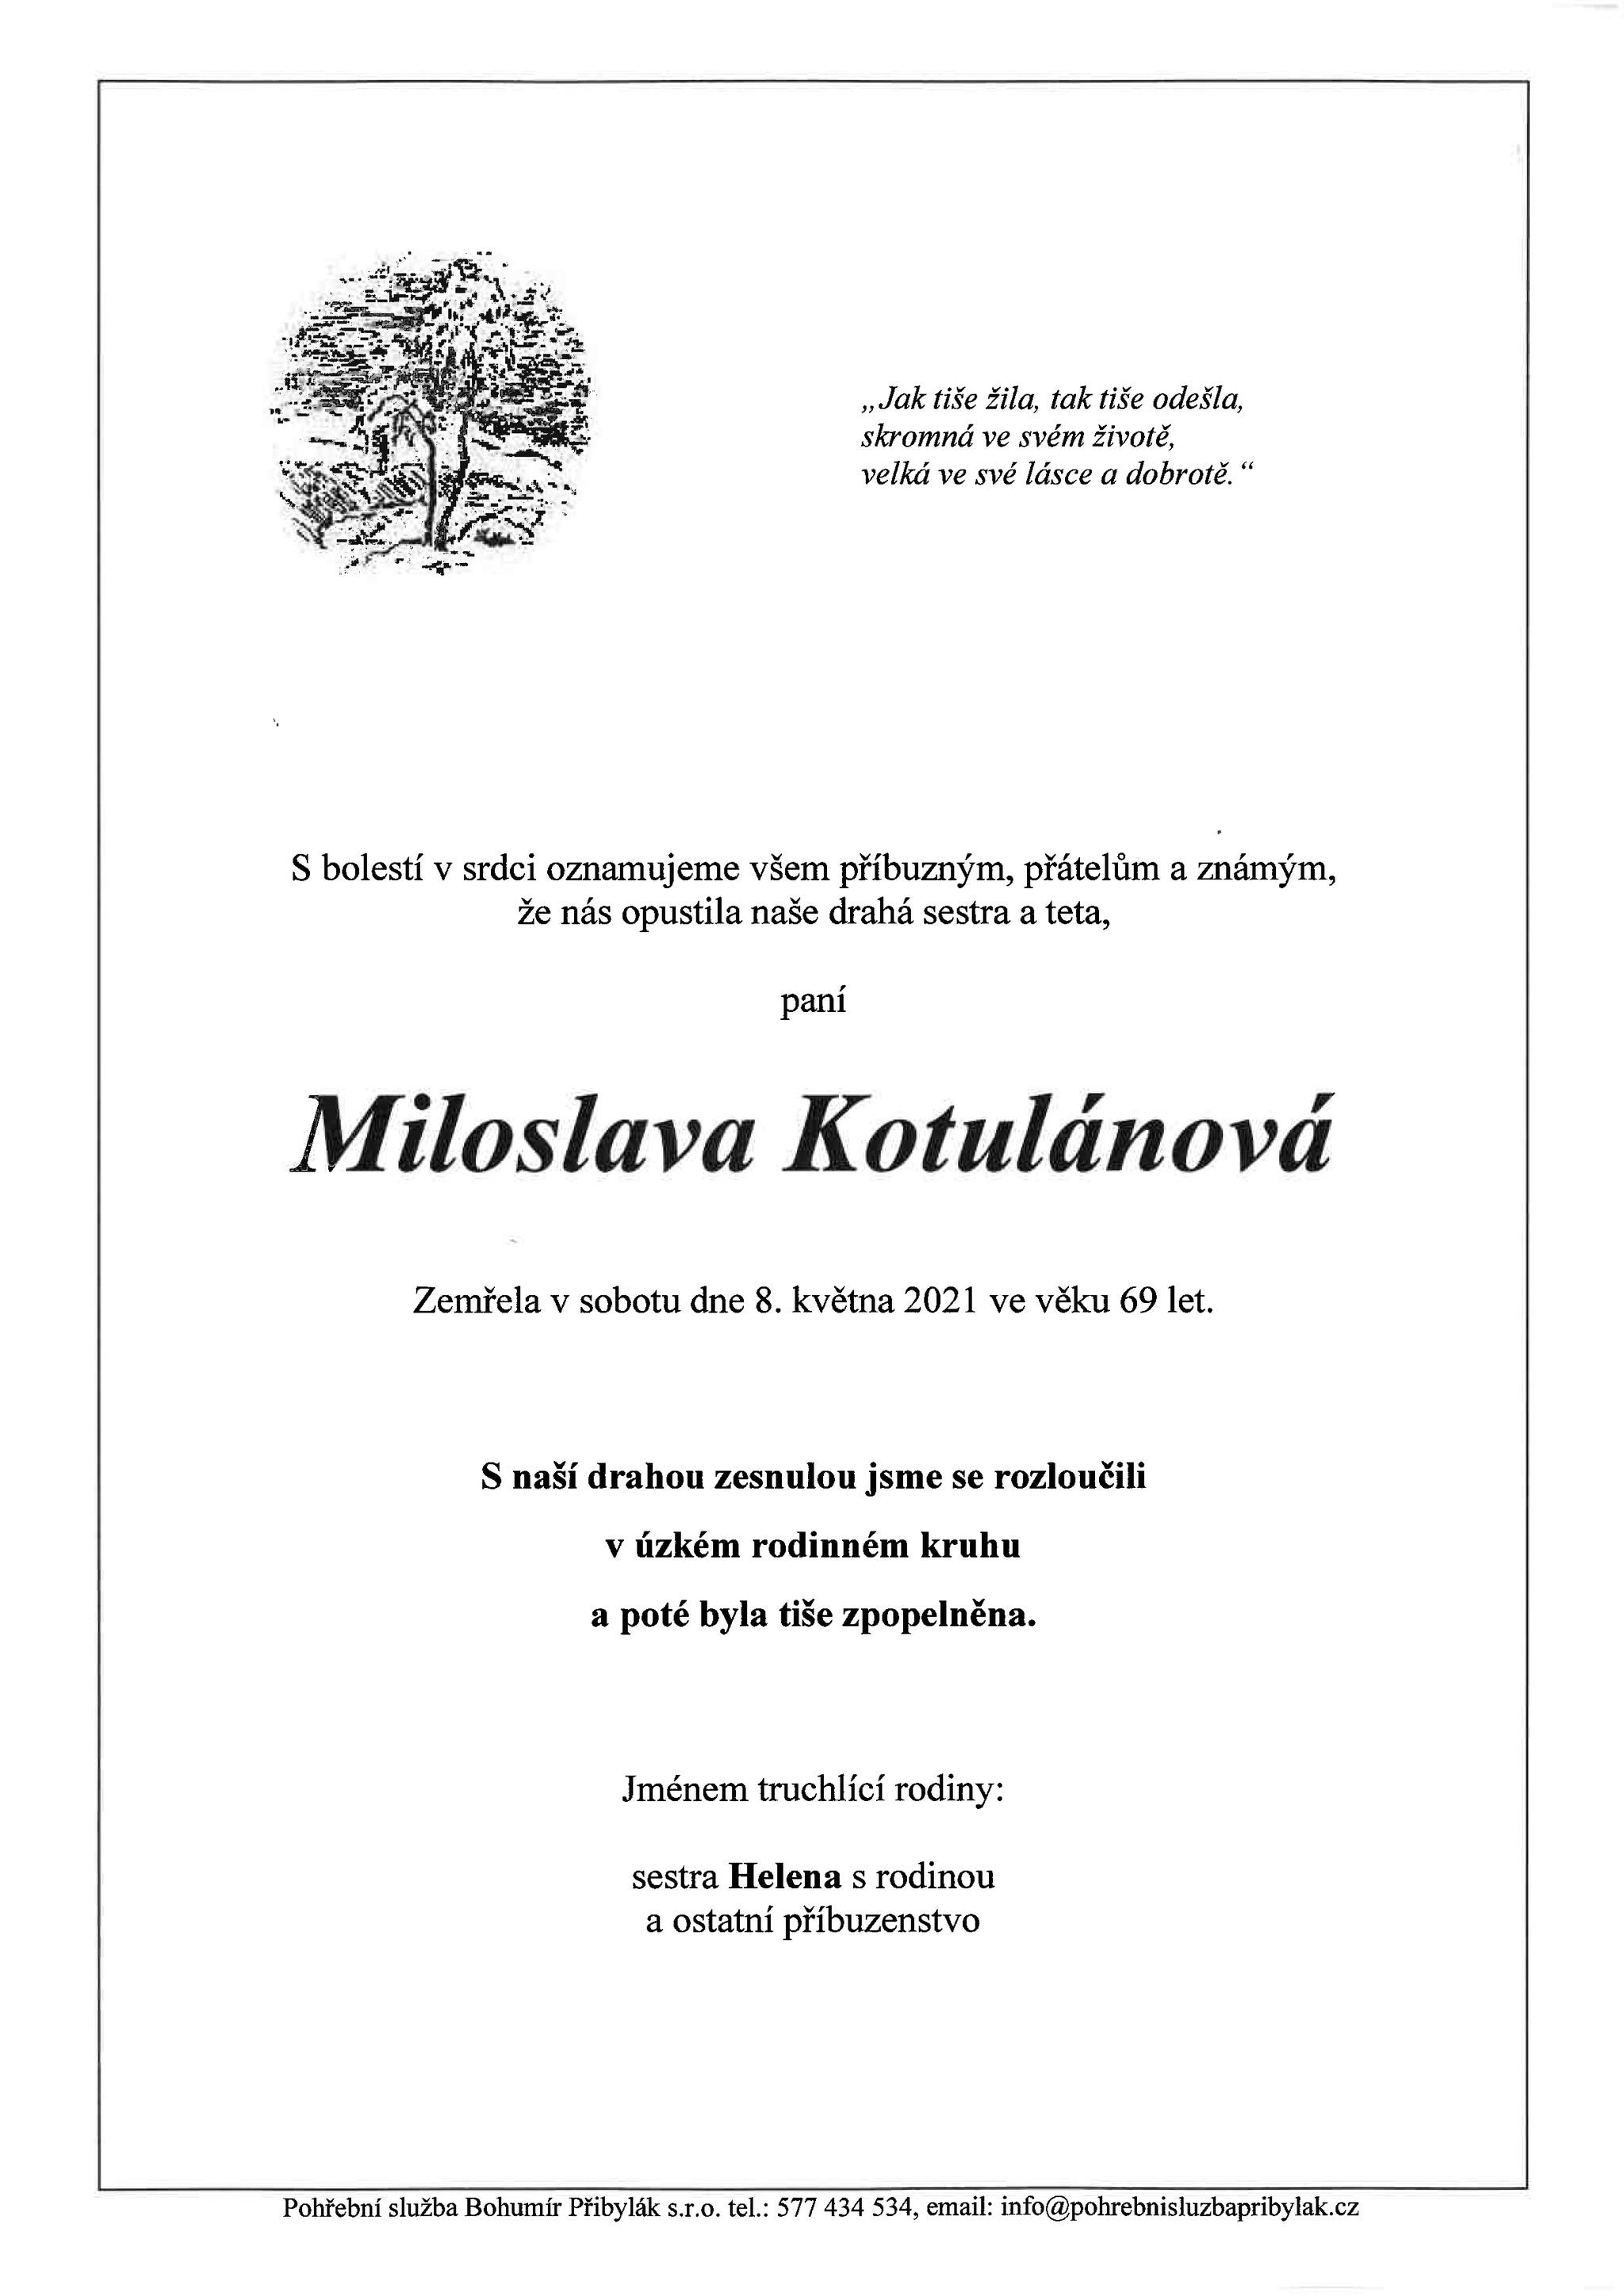 Miloslava Kotulánová